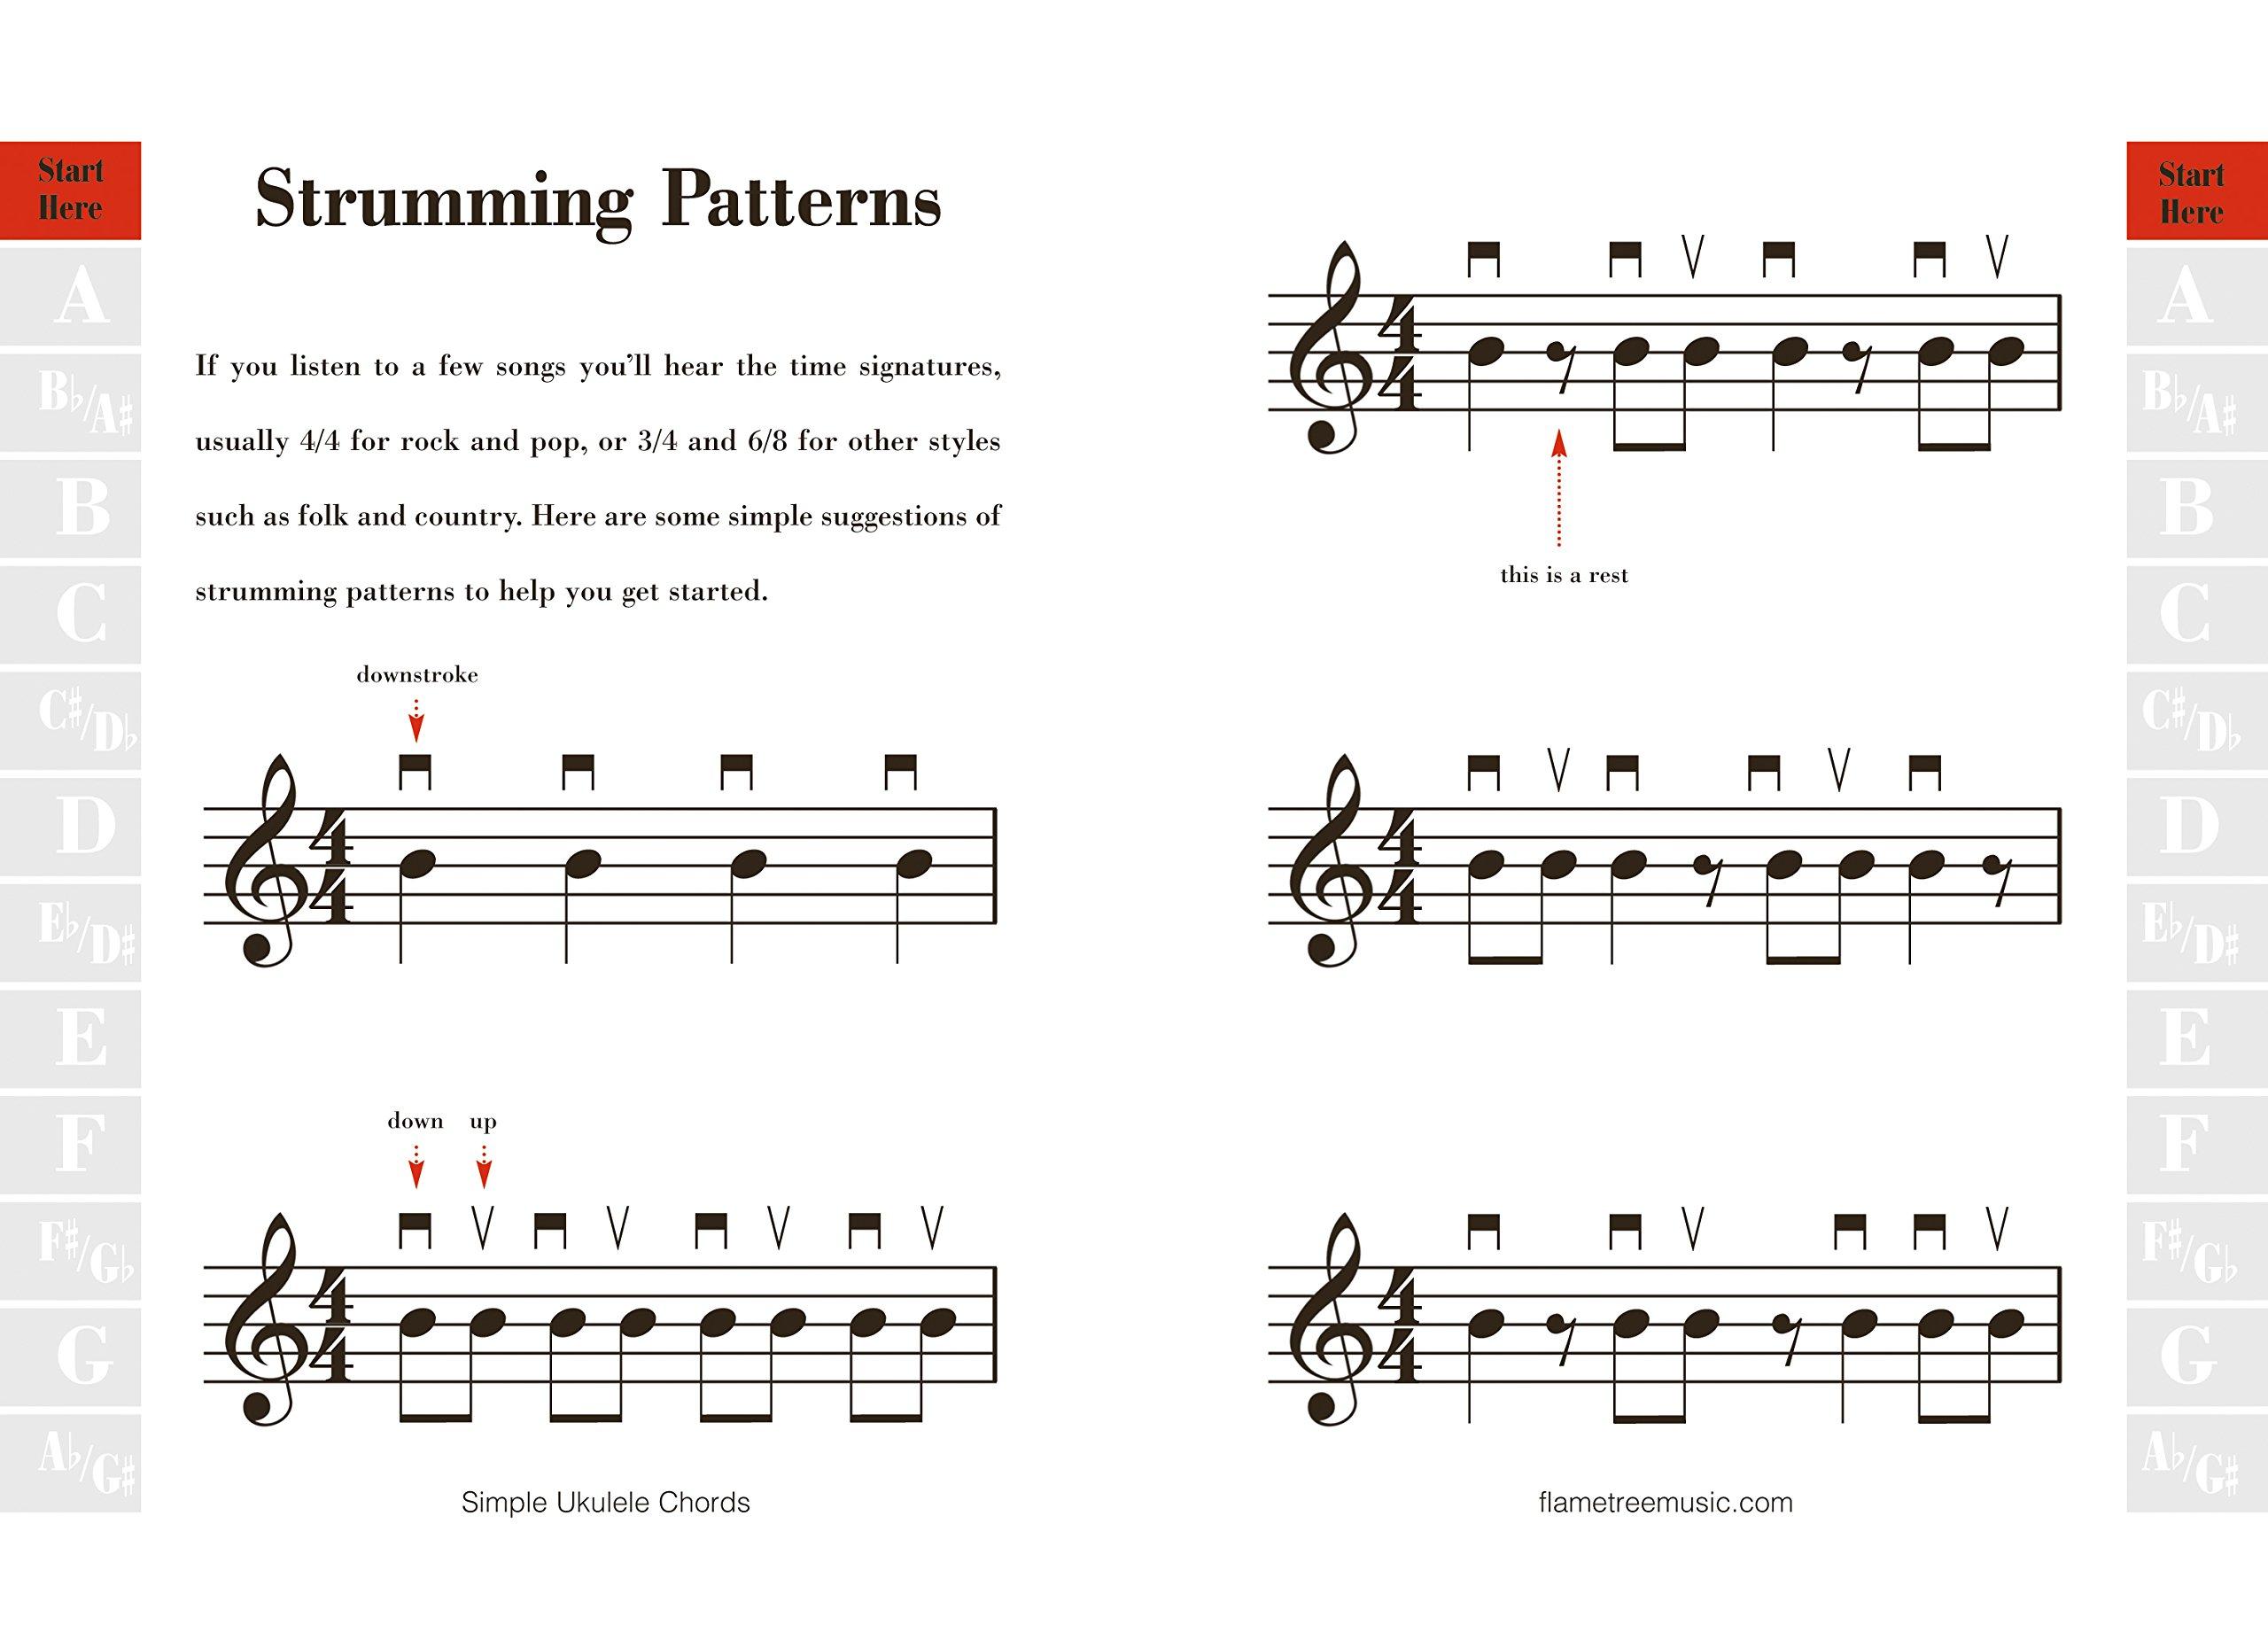 Amazon simple ukulele chords easy to use easy to carry the amazon simple ukulele chords easy to use easy to carry the essential playing companion 9781783613168 jake jackson books hexwebz Image collections